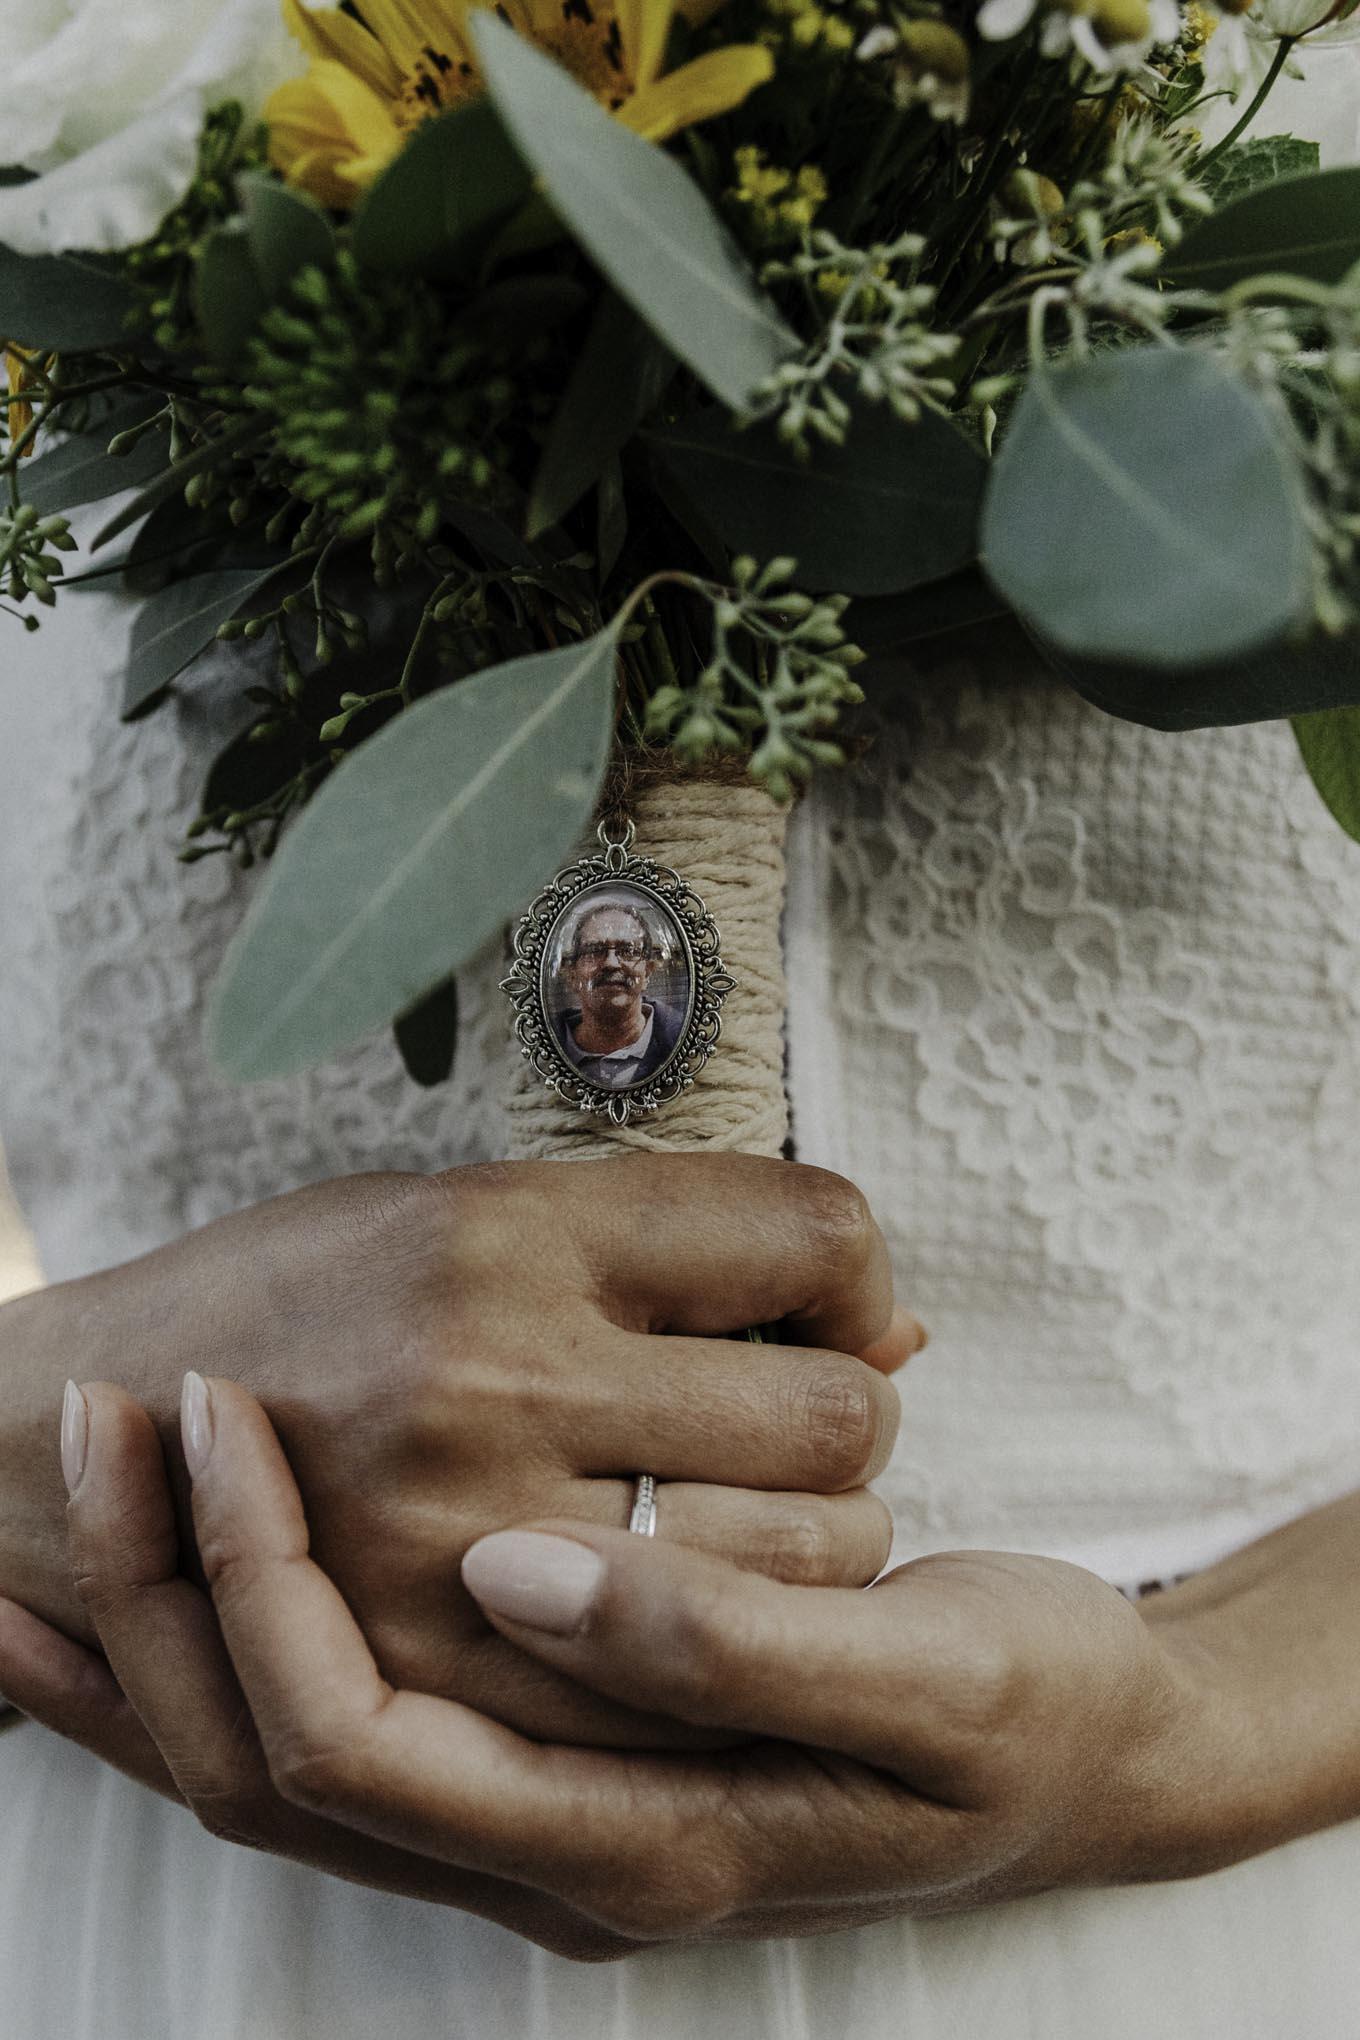 Fotoanhänger am Brautstrauß